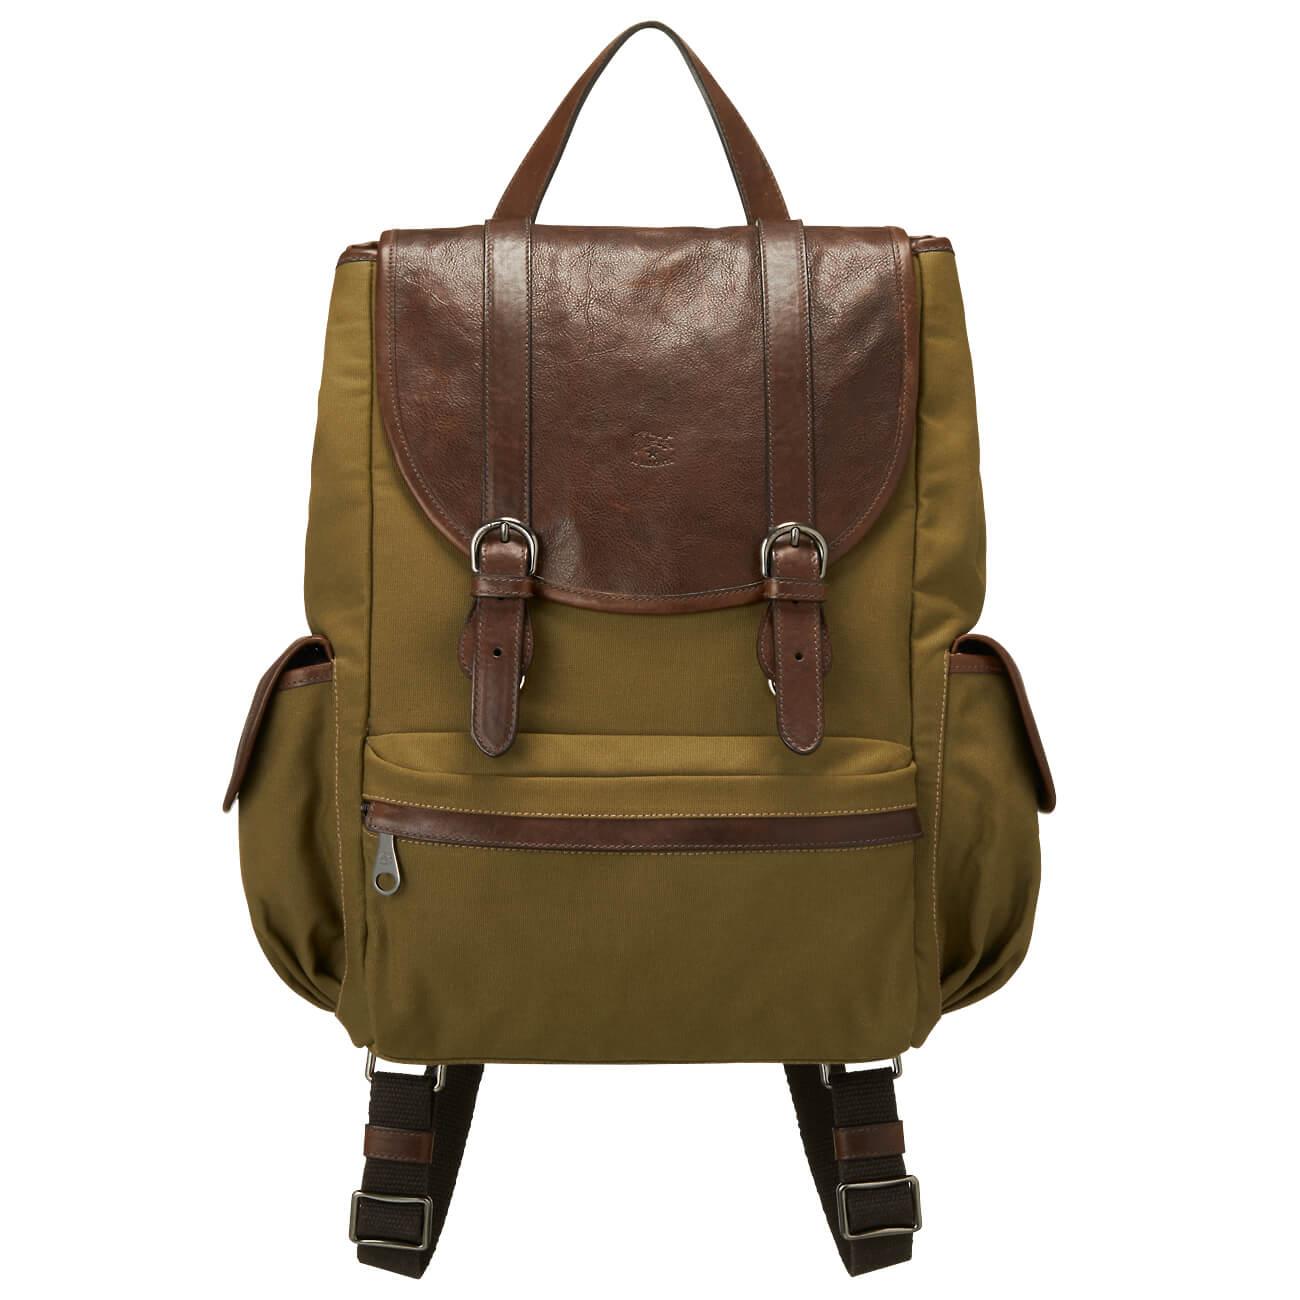 IL BISONTE (イル ビゾンテ) 日本公式オンラインストア バッグパック 54192309123